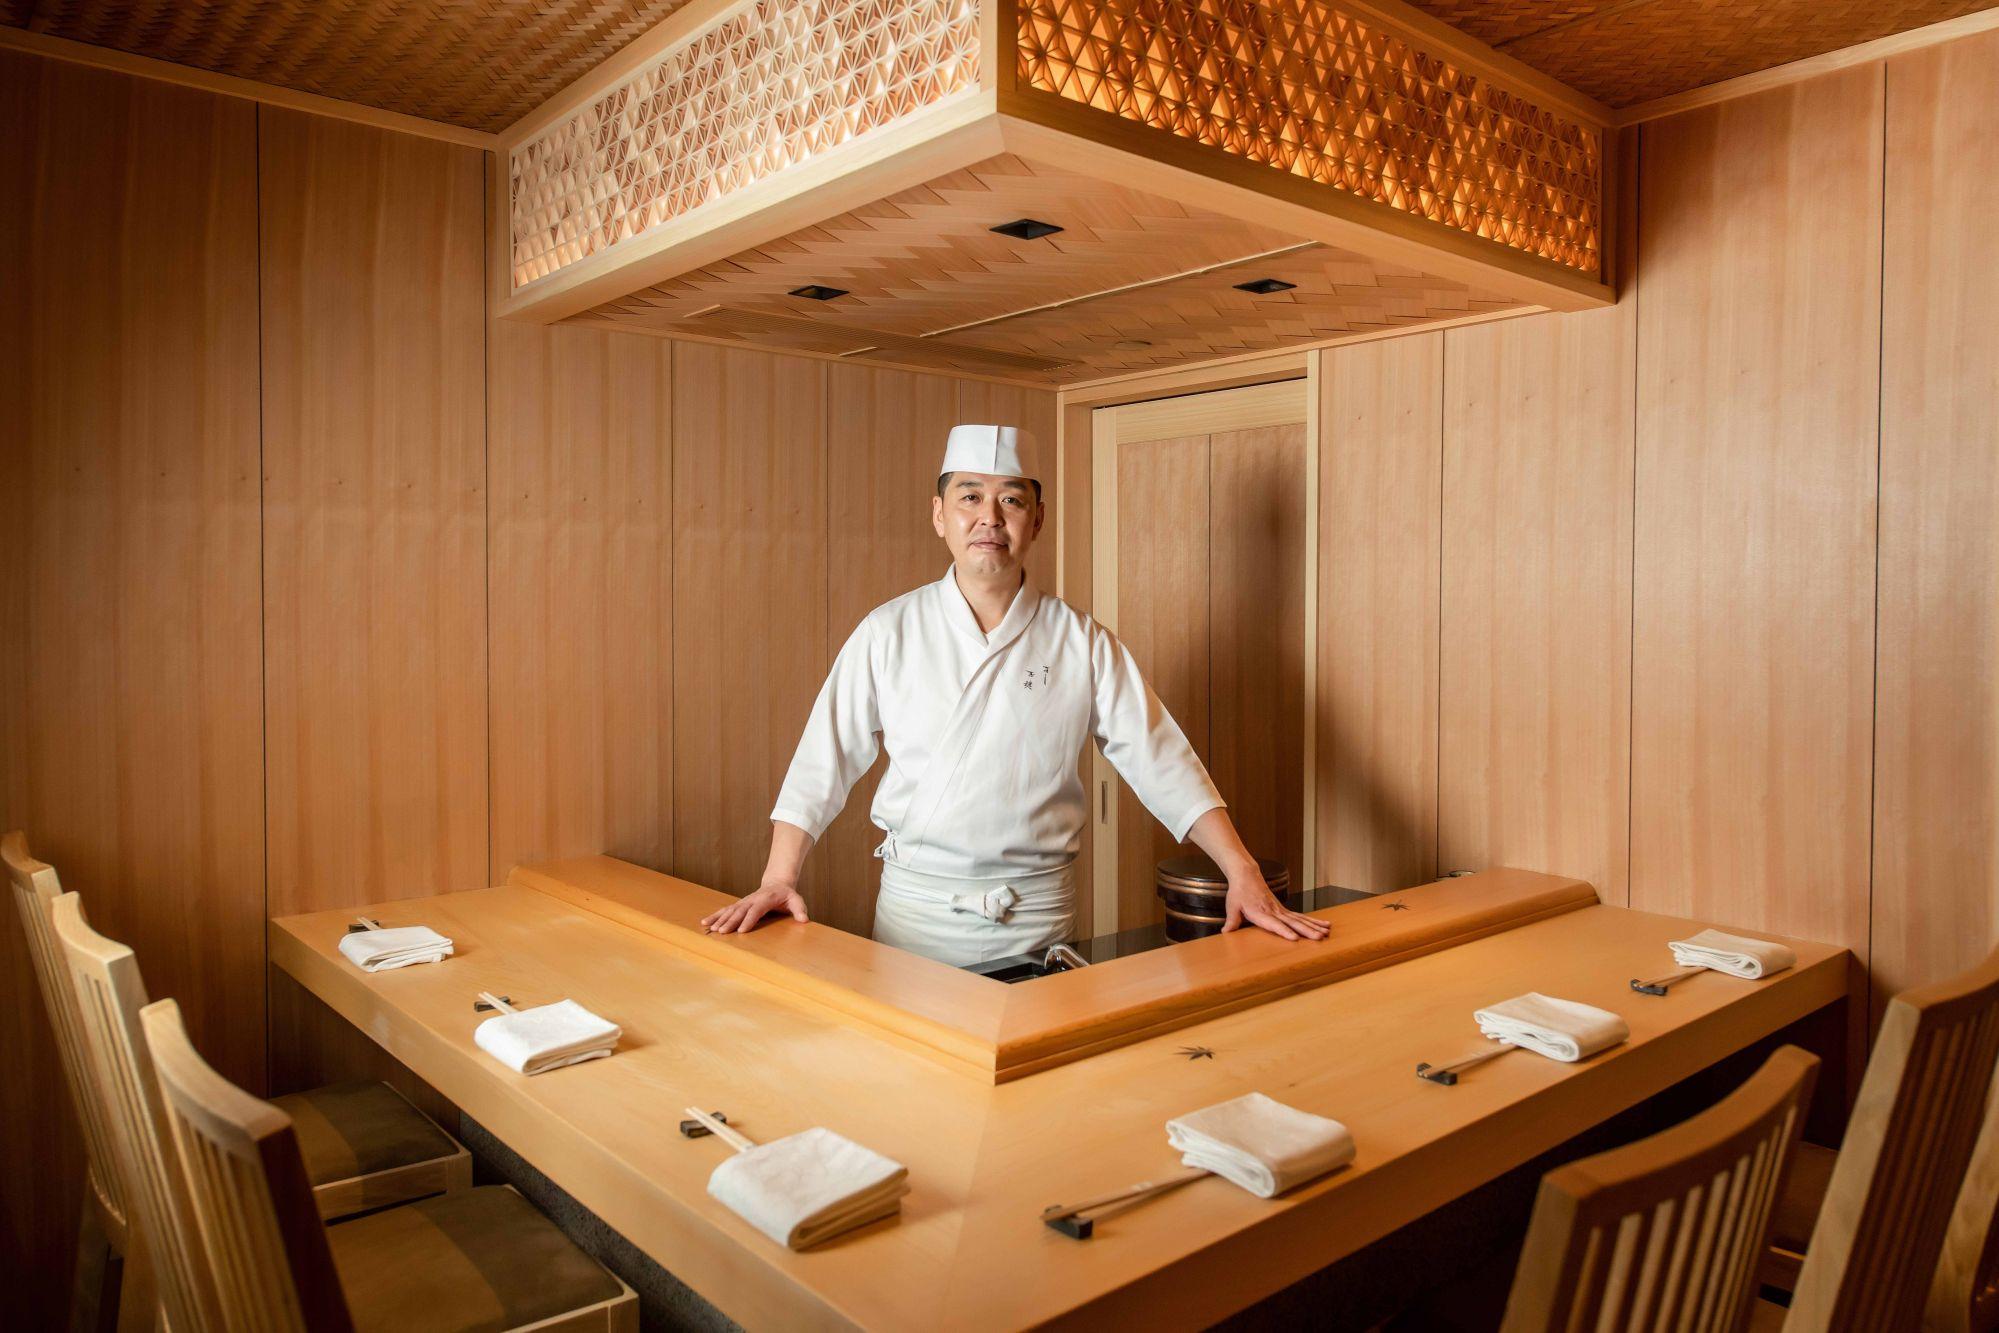 First Look: The New Sushi Shikon At Landmark Mandarin Oriental